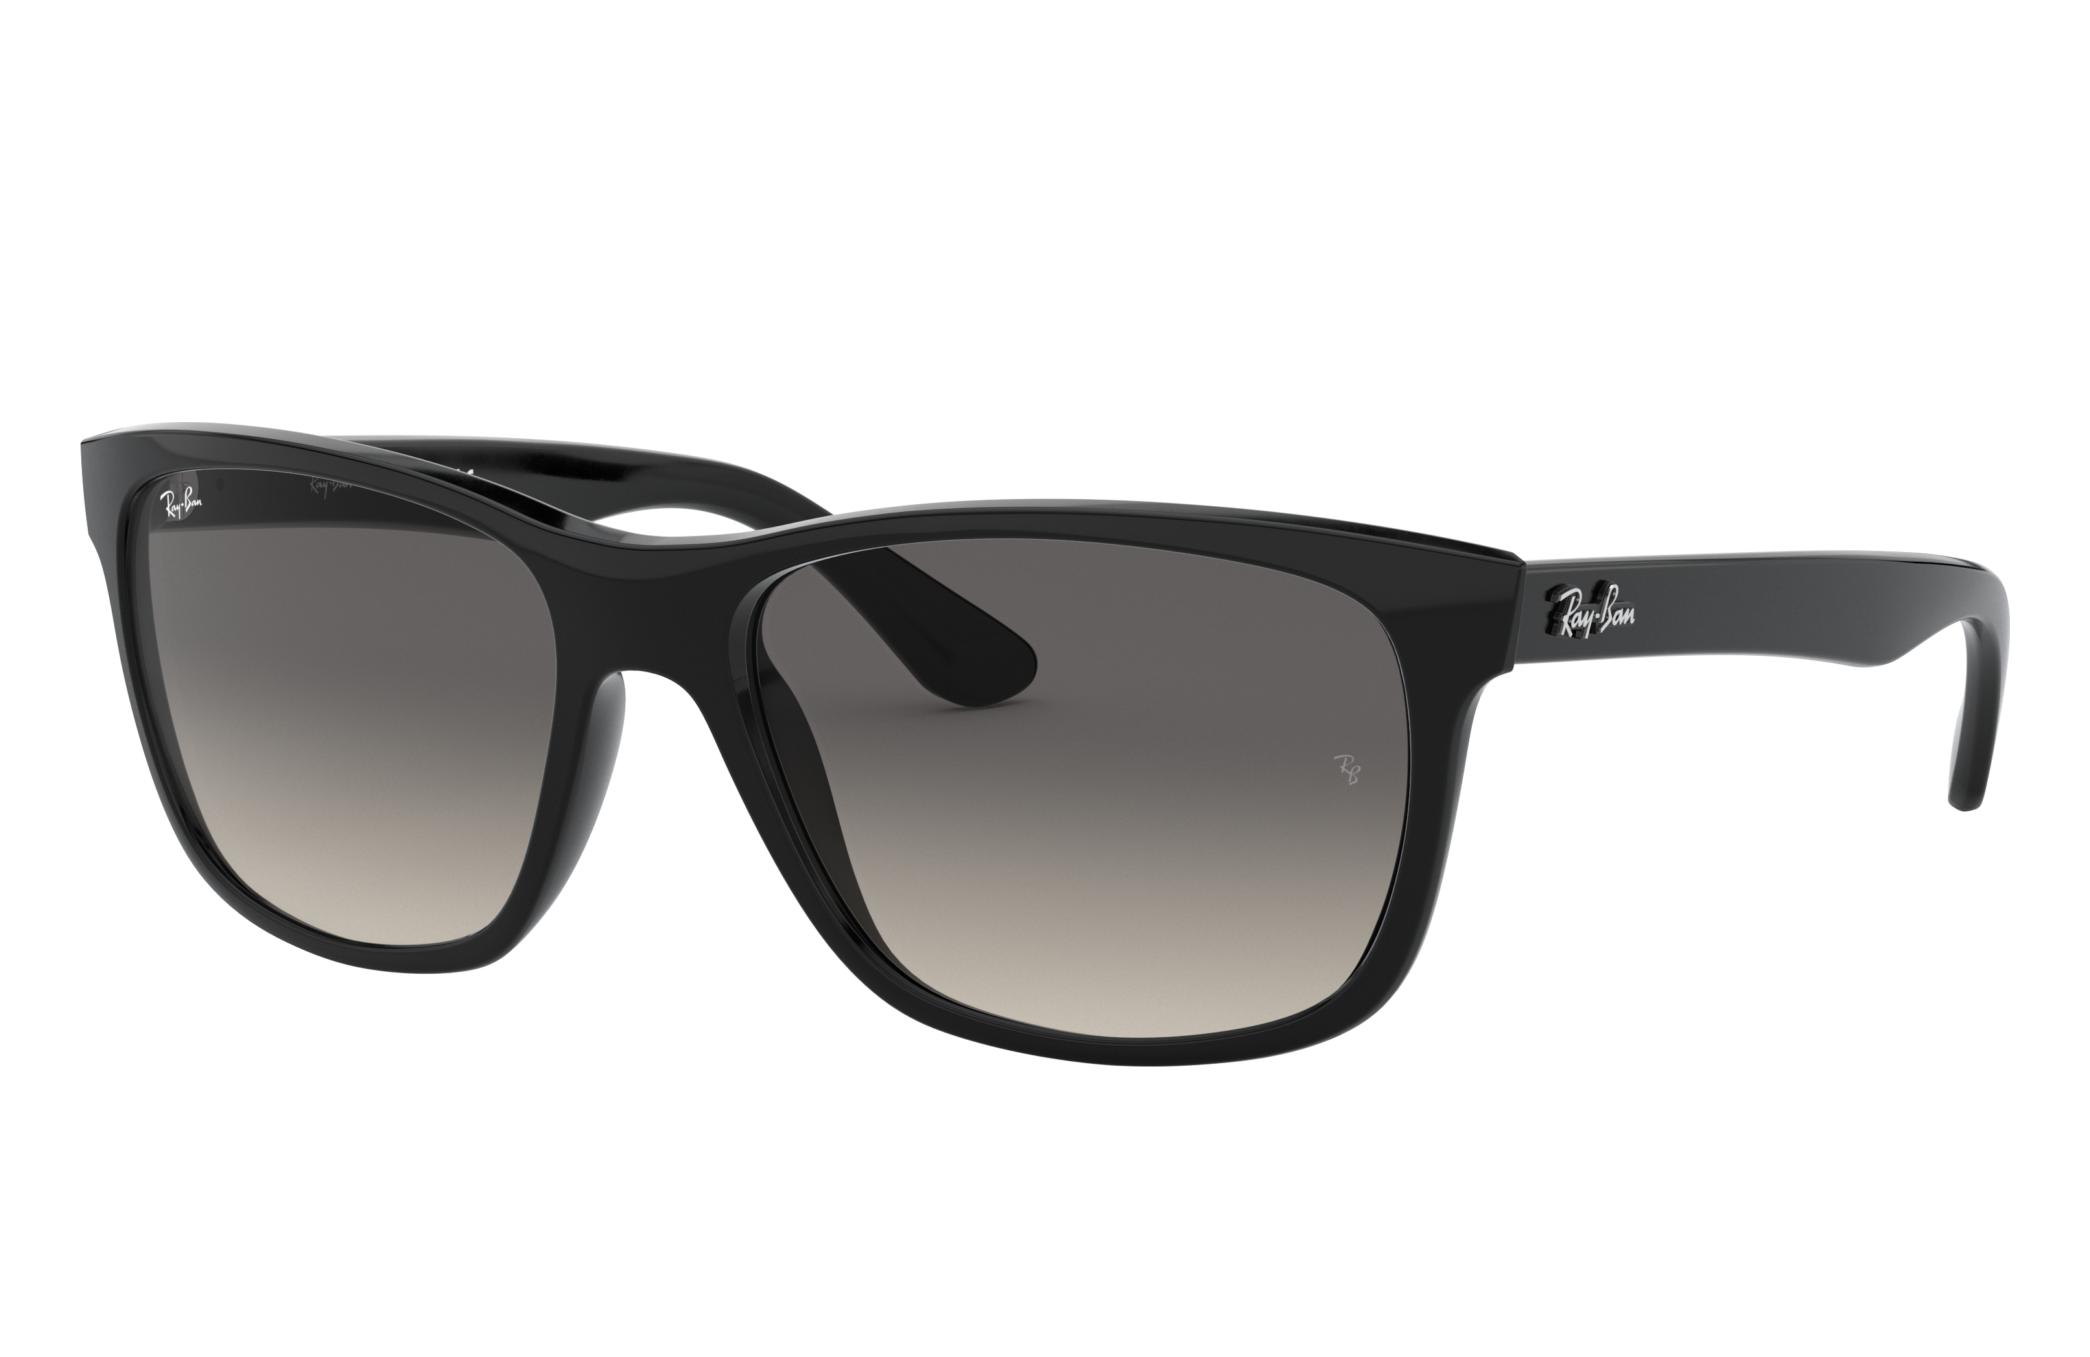 Ray-Ban Rb4181 Black, Gray Lenses - RB4181